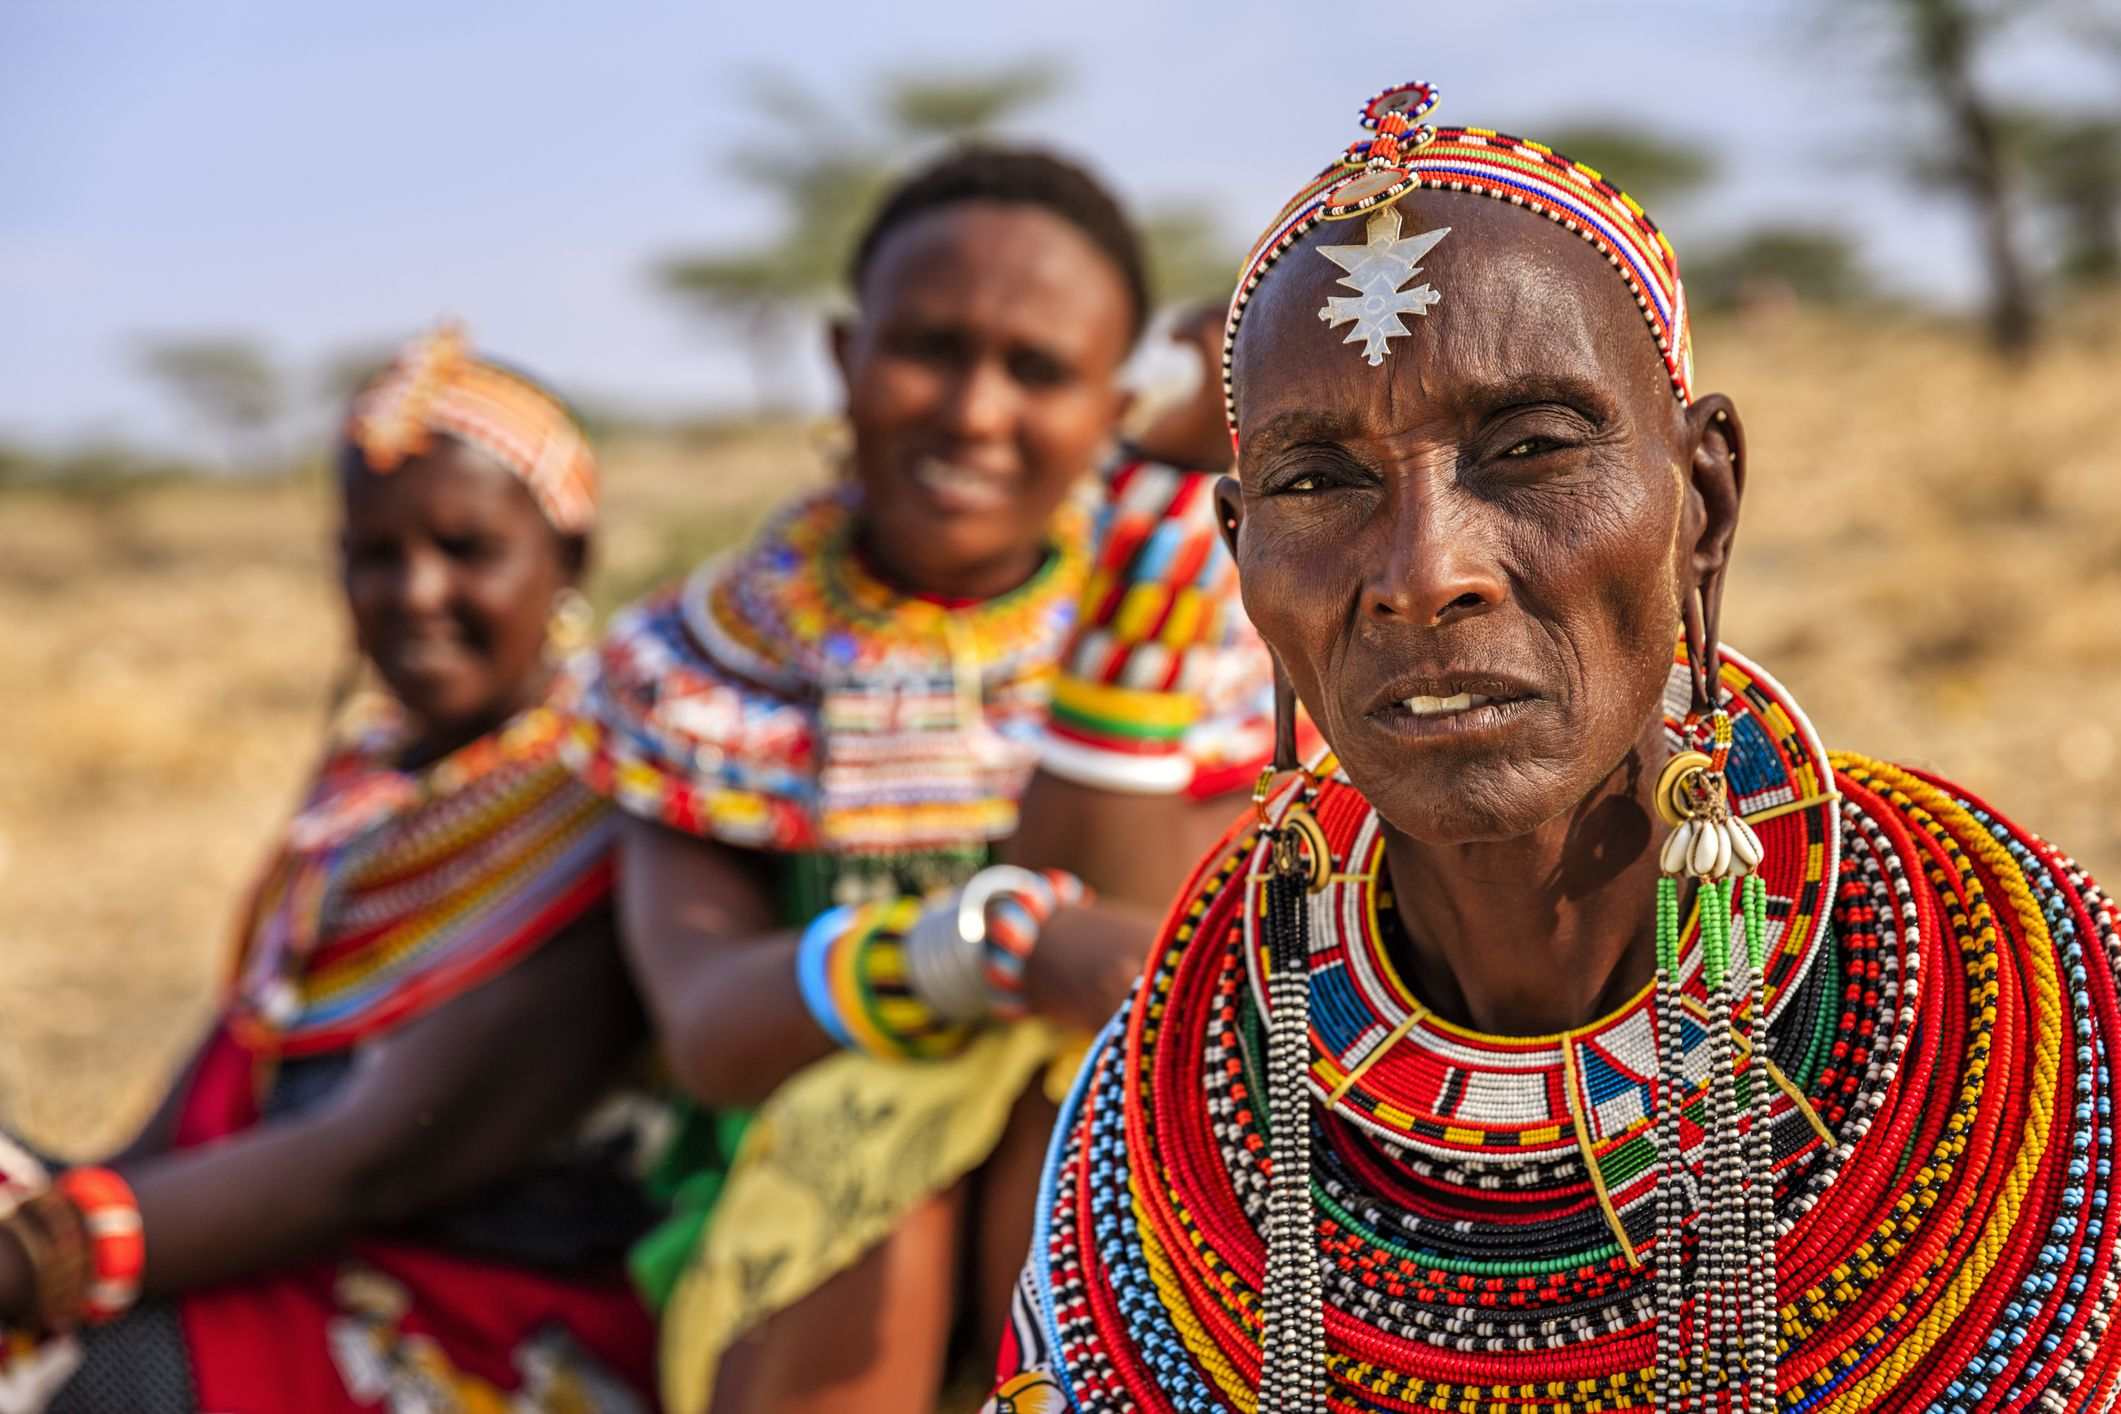 Kenia Mk Tramping